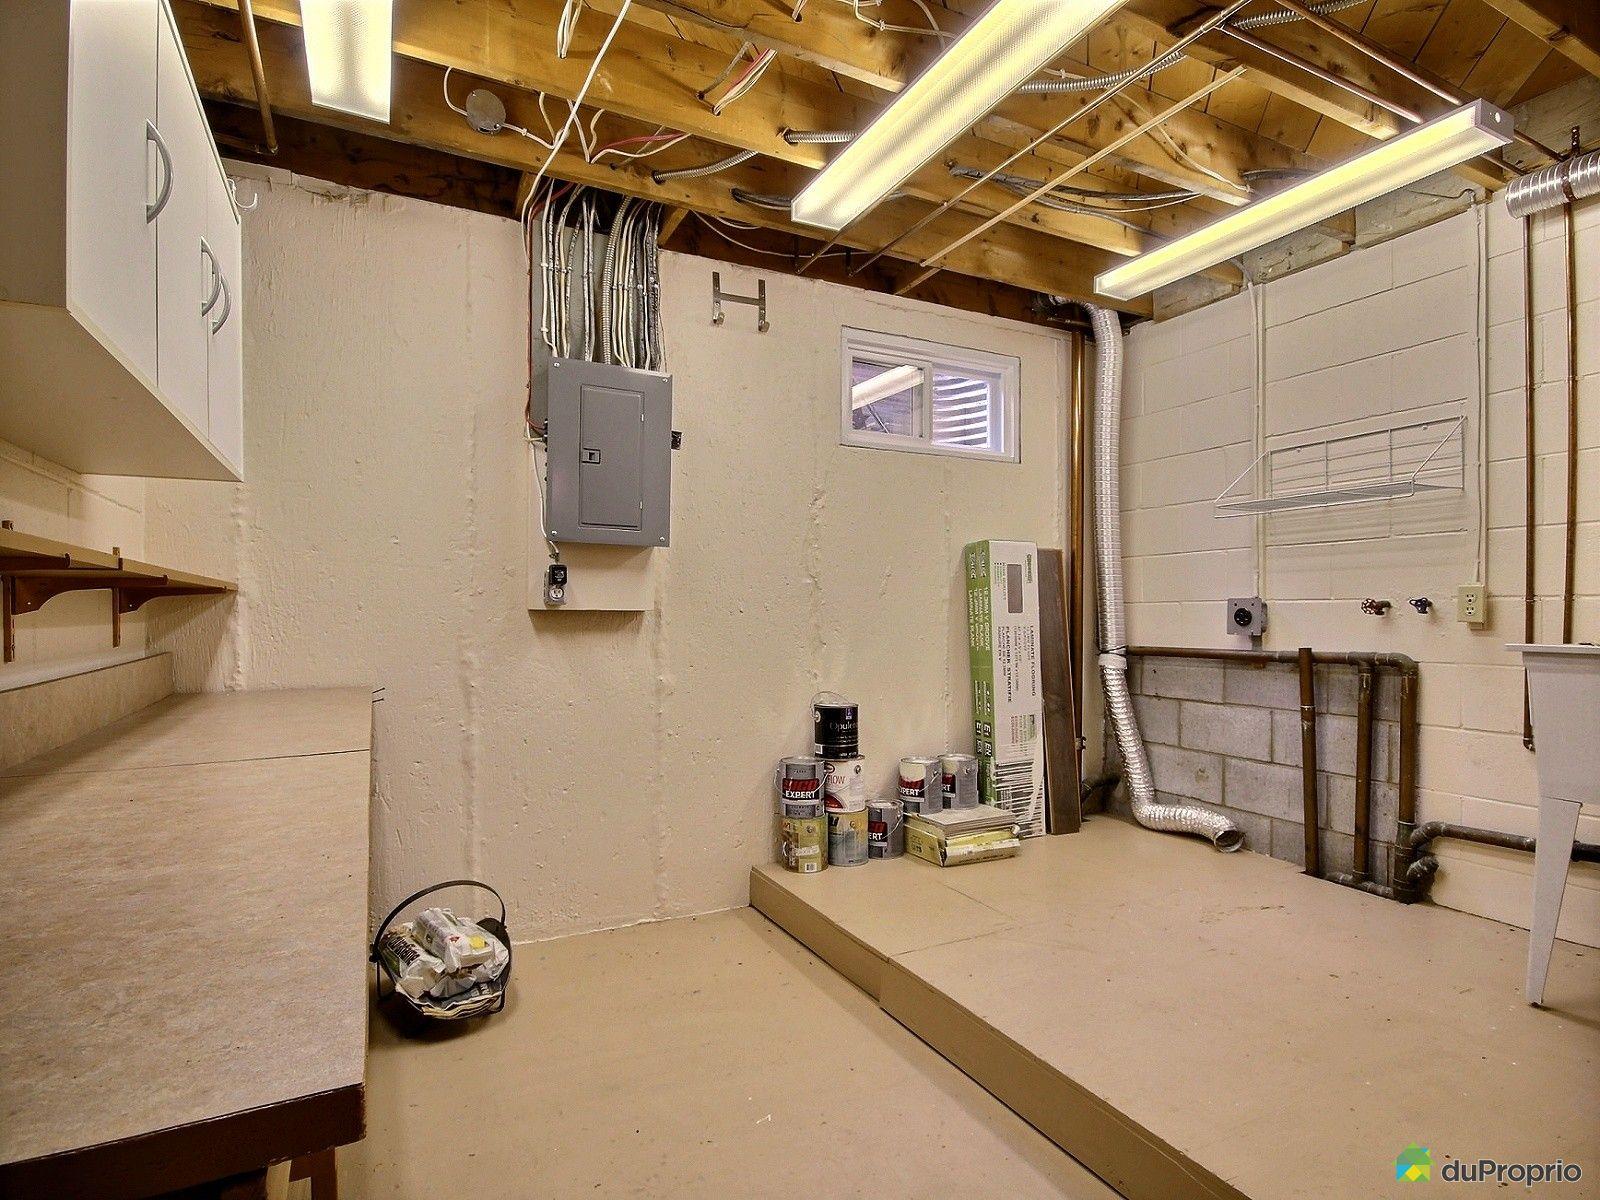 maison vendu ste foy immobilier qu bec duproprio 540739. Black Bedroom Furniture Sets. Home Design Ideas